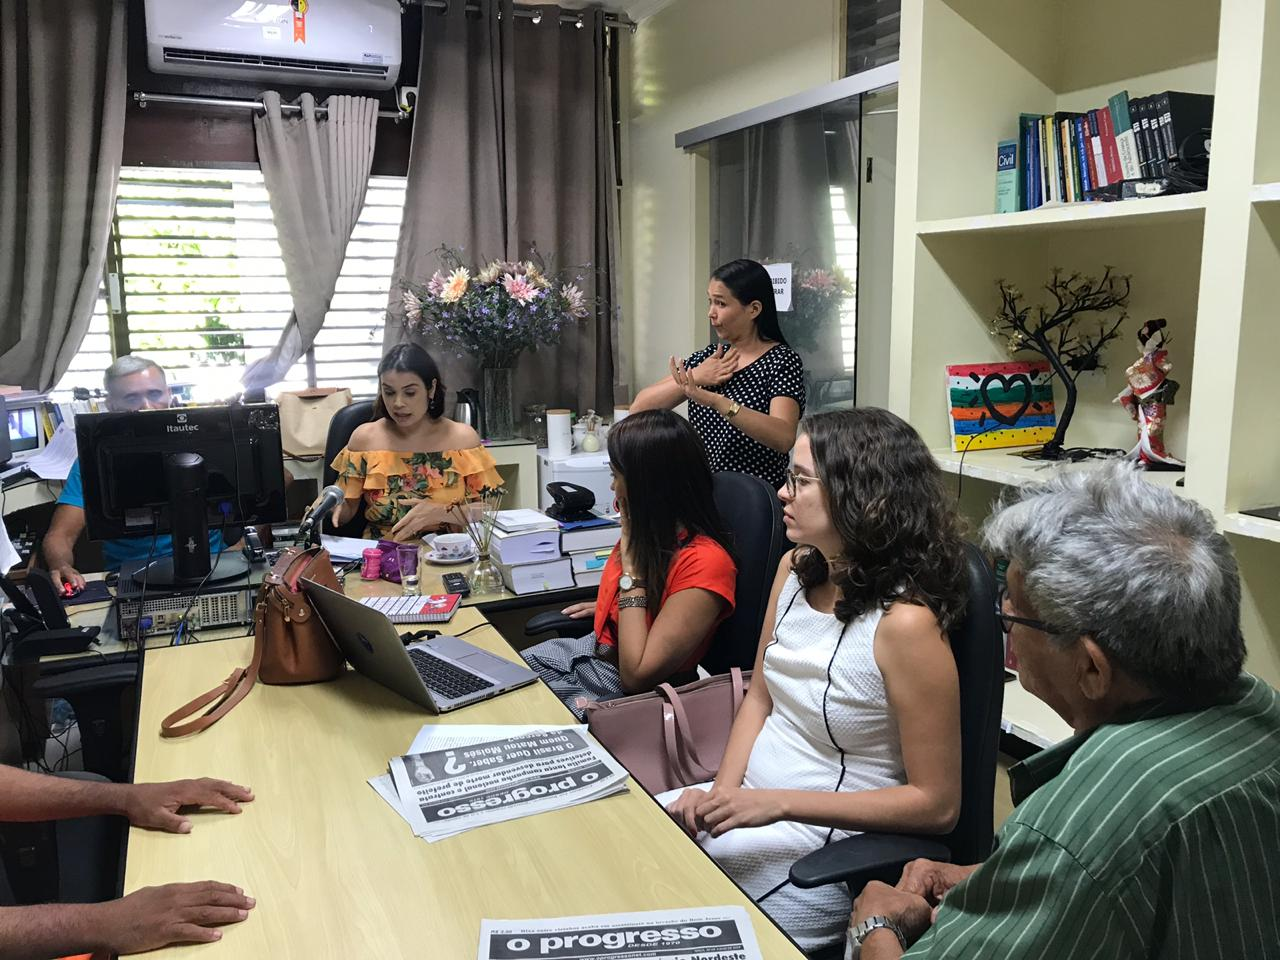 IMPERATRIZ | Juíza utiliza intérprete de LIBRAS em audiência de custódia com surdo-mudo